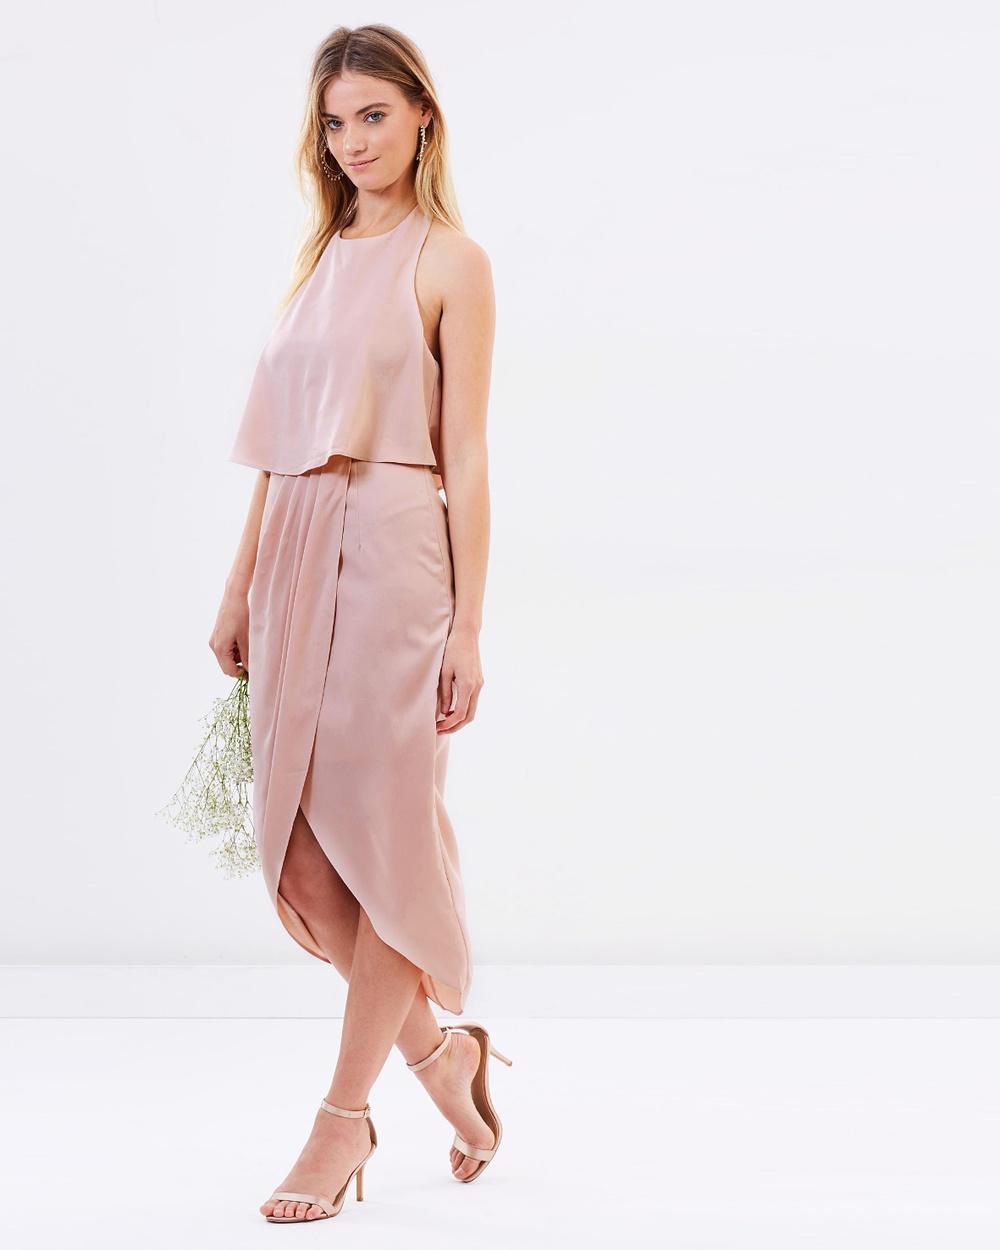 Atmos & Here ICONIC EXCLUSIVE Allie Midi Dress Bridesmaid Dresses Nude Pink ICONIC EXCLUSIVE Allie Midi Dress